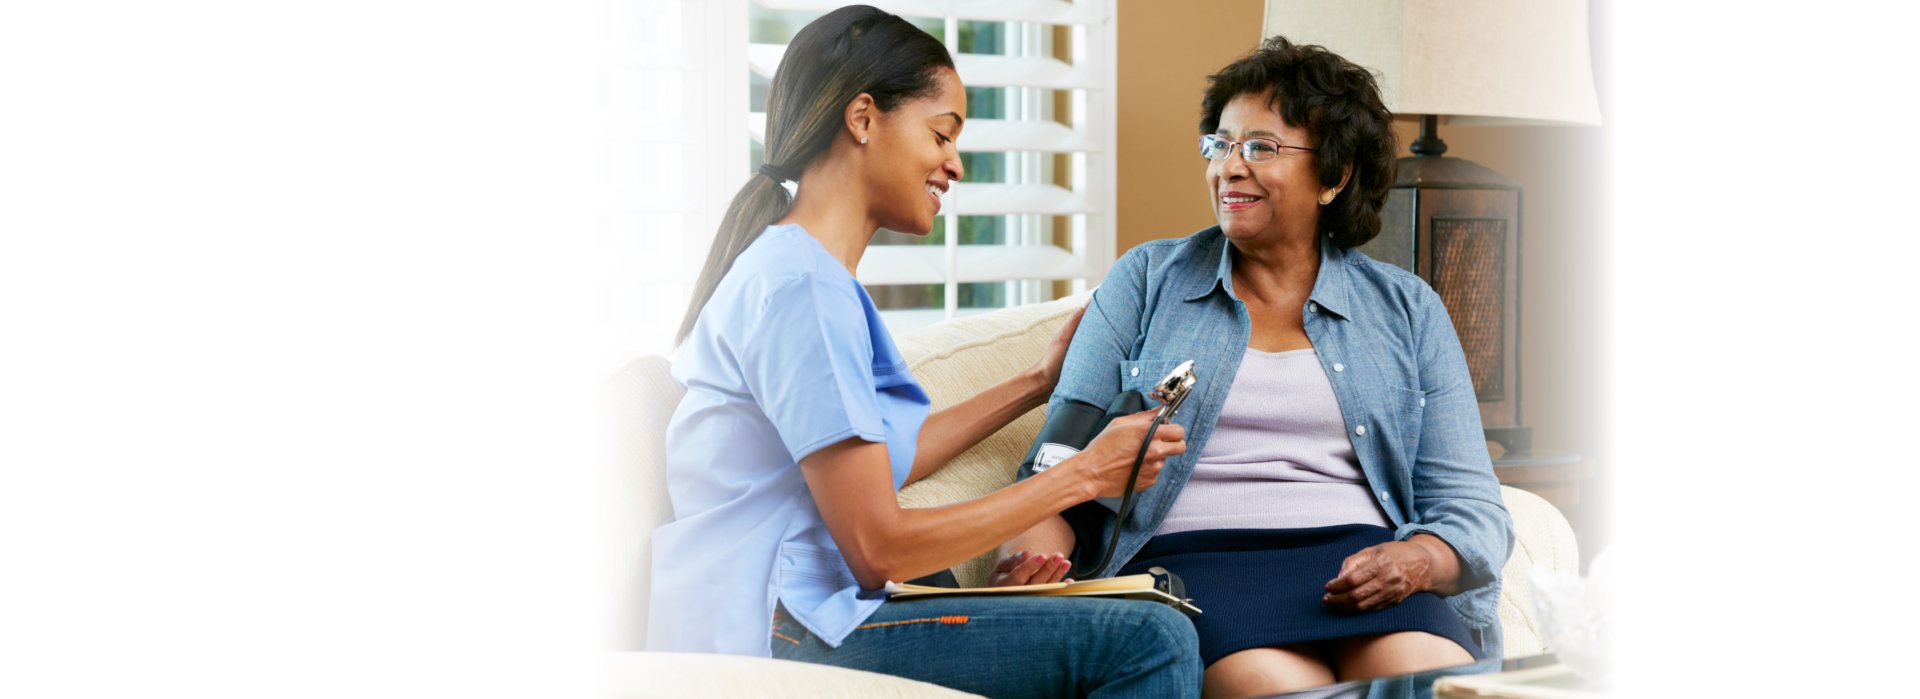 Nurse Visiting Senior Female Patient At Home Smiling